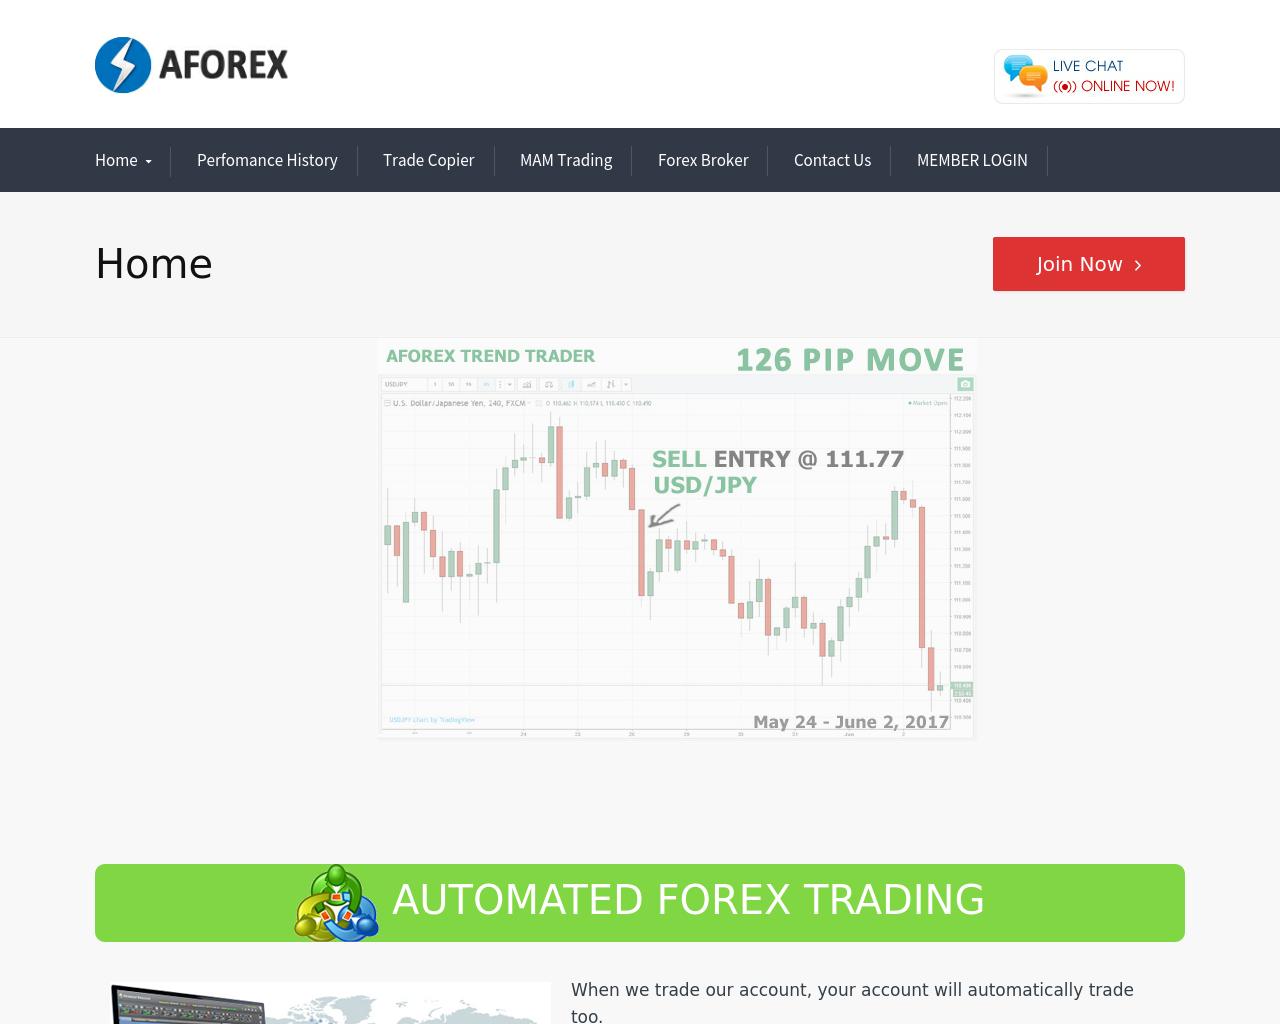 Aforex-Advertising-Reviews-Pricing